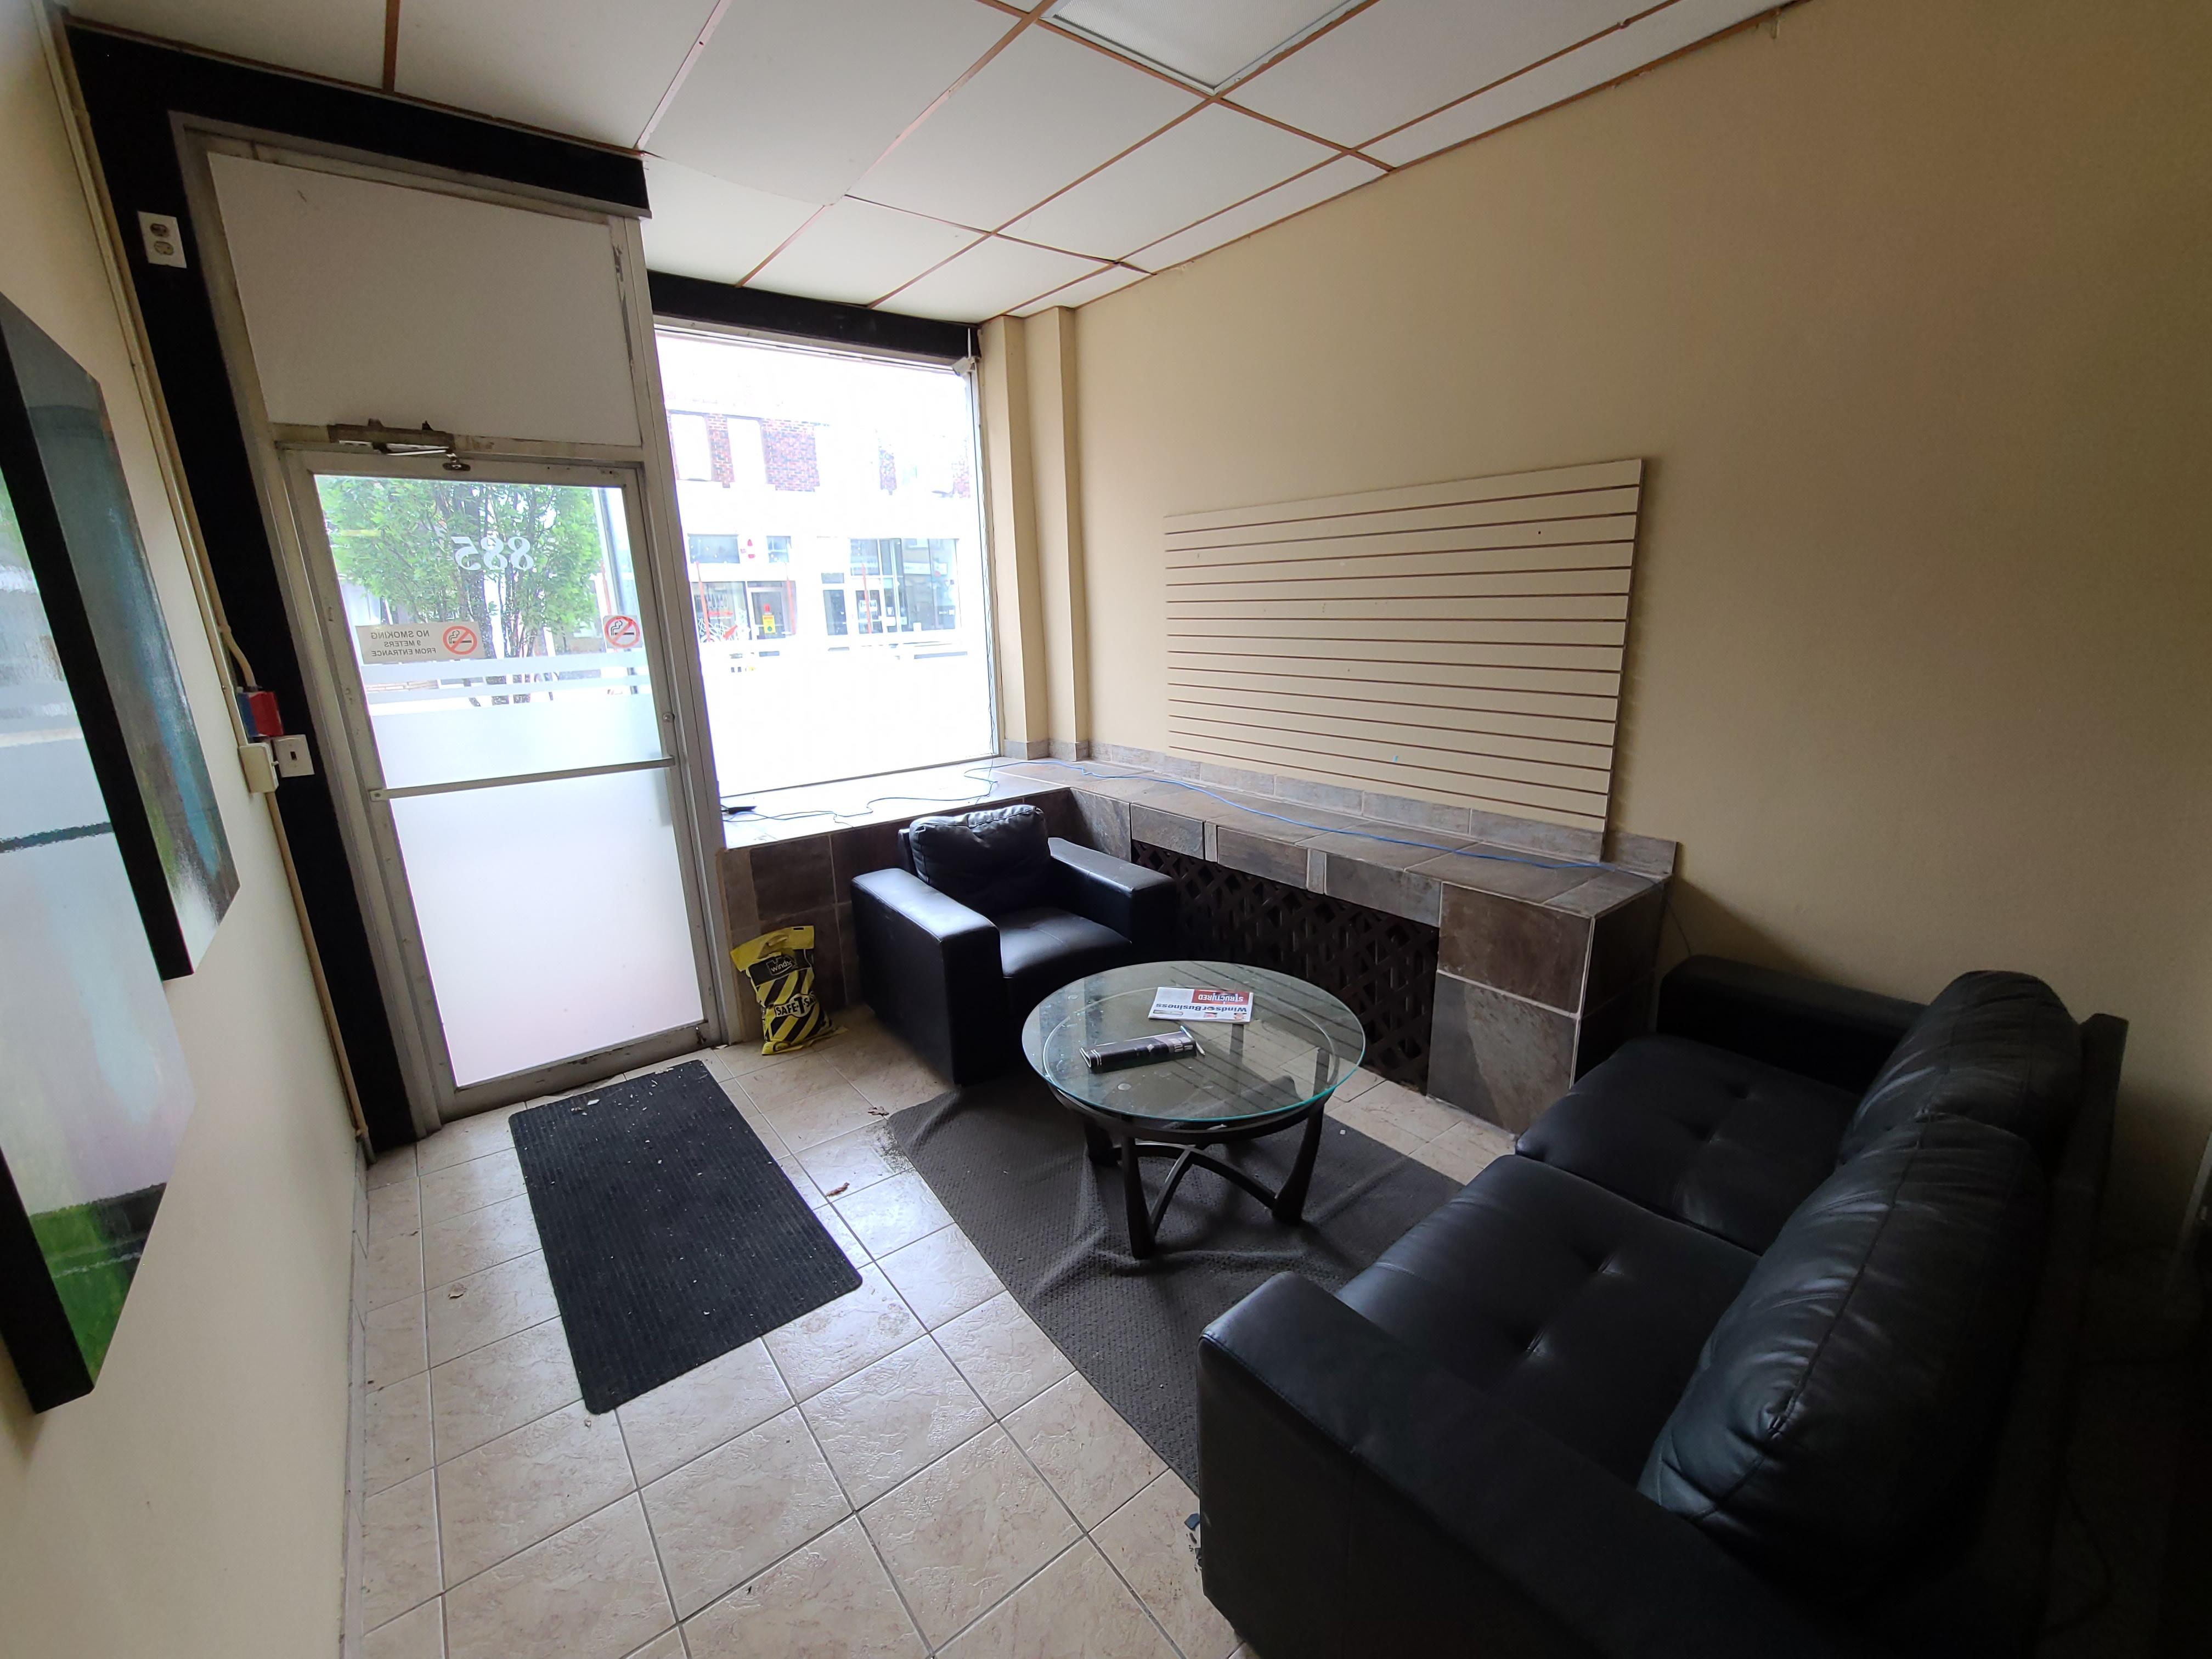 881-883-885 Erie Street E, Windsor, Ontario  N9A 3Y7 - Photo 5 - RP1188742101